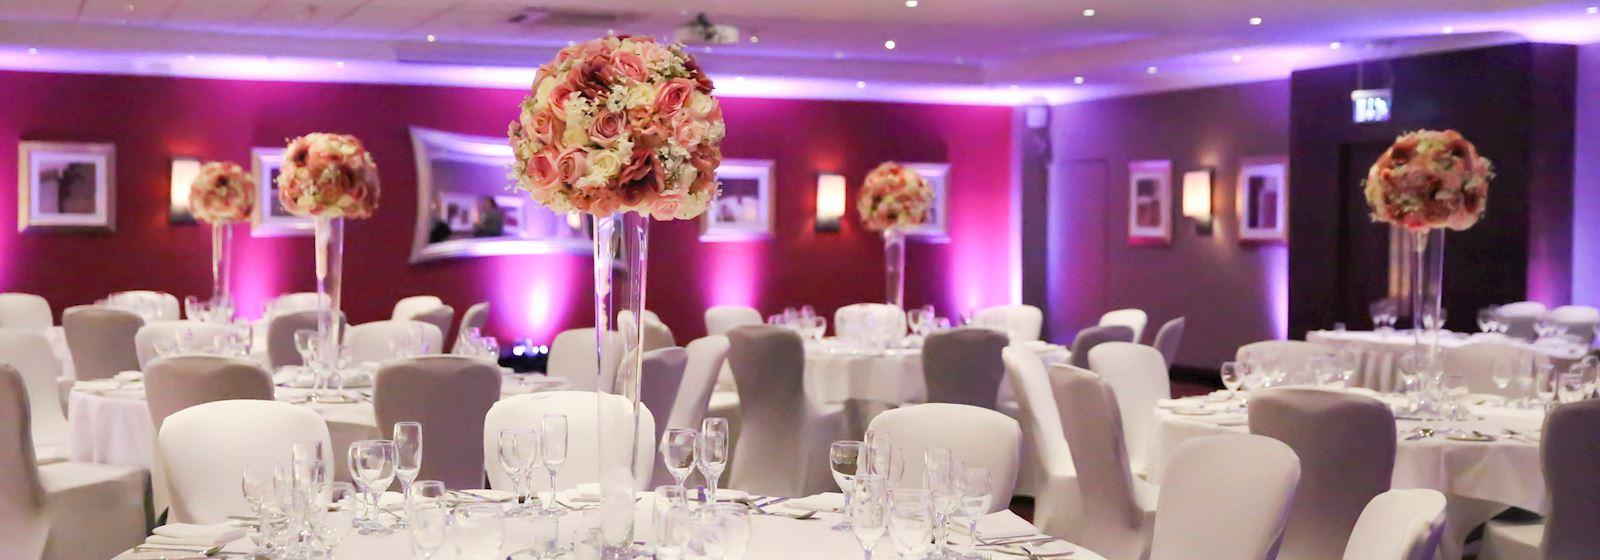 Edinburgh Marriott Hotel Weddings